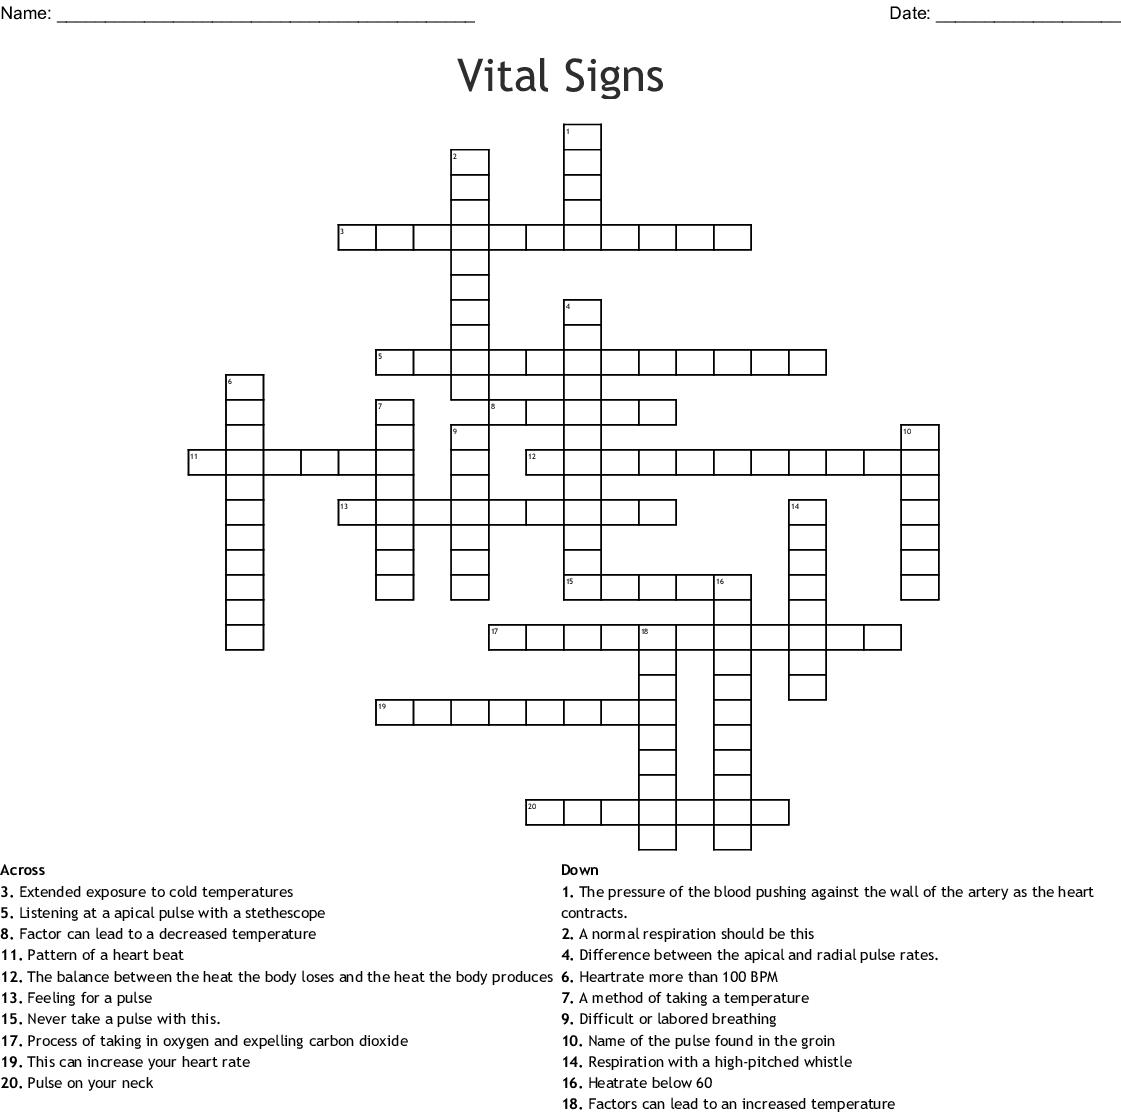 Vital Signs Crossword